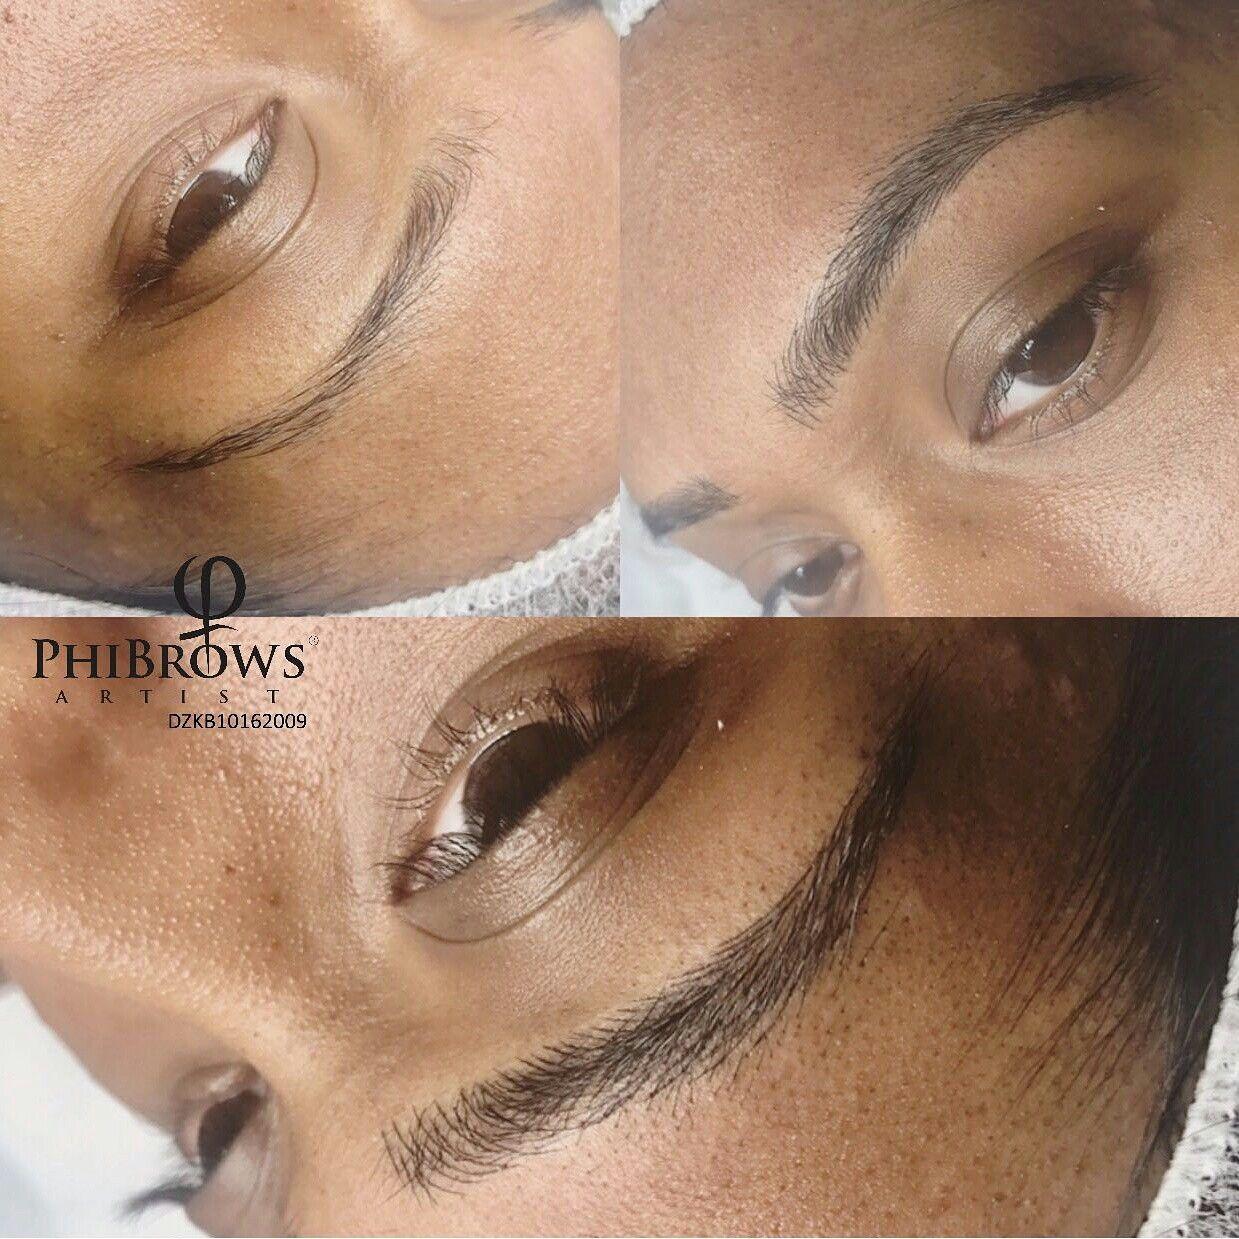 Pin by Theresa Dunn on Make up tips I love Microblading